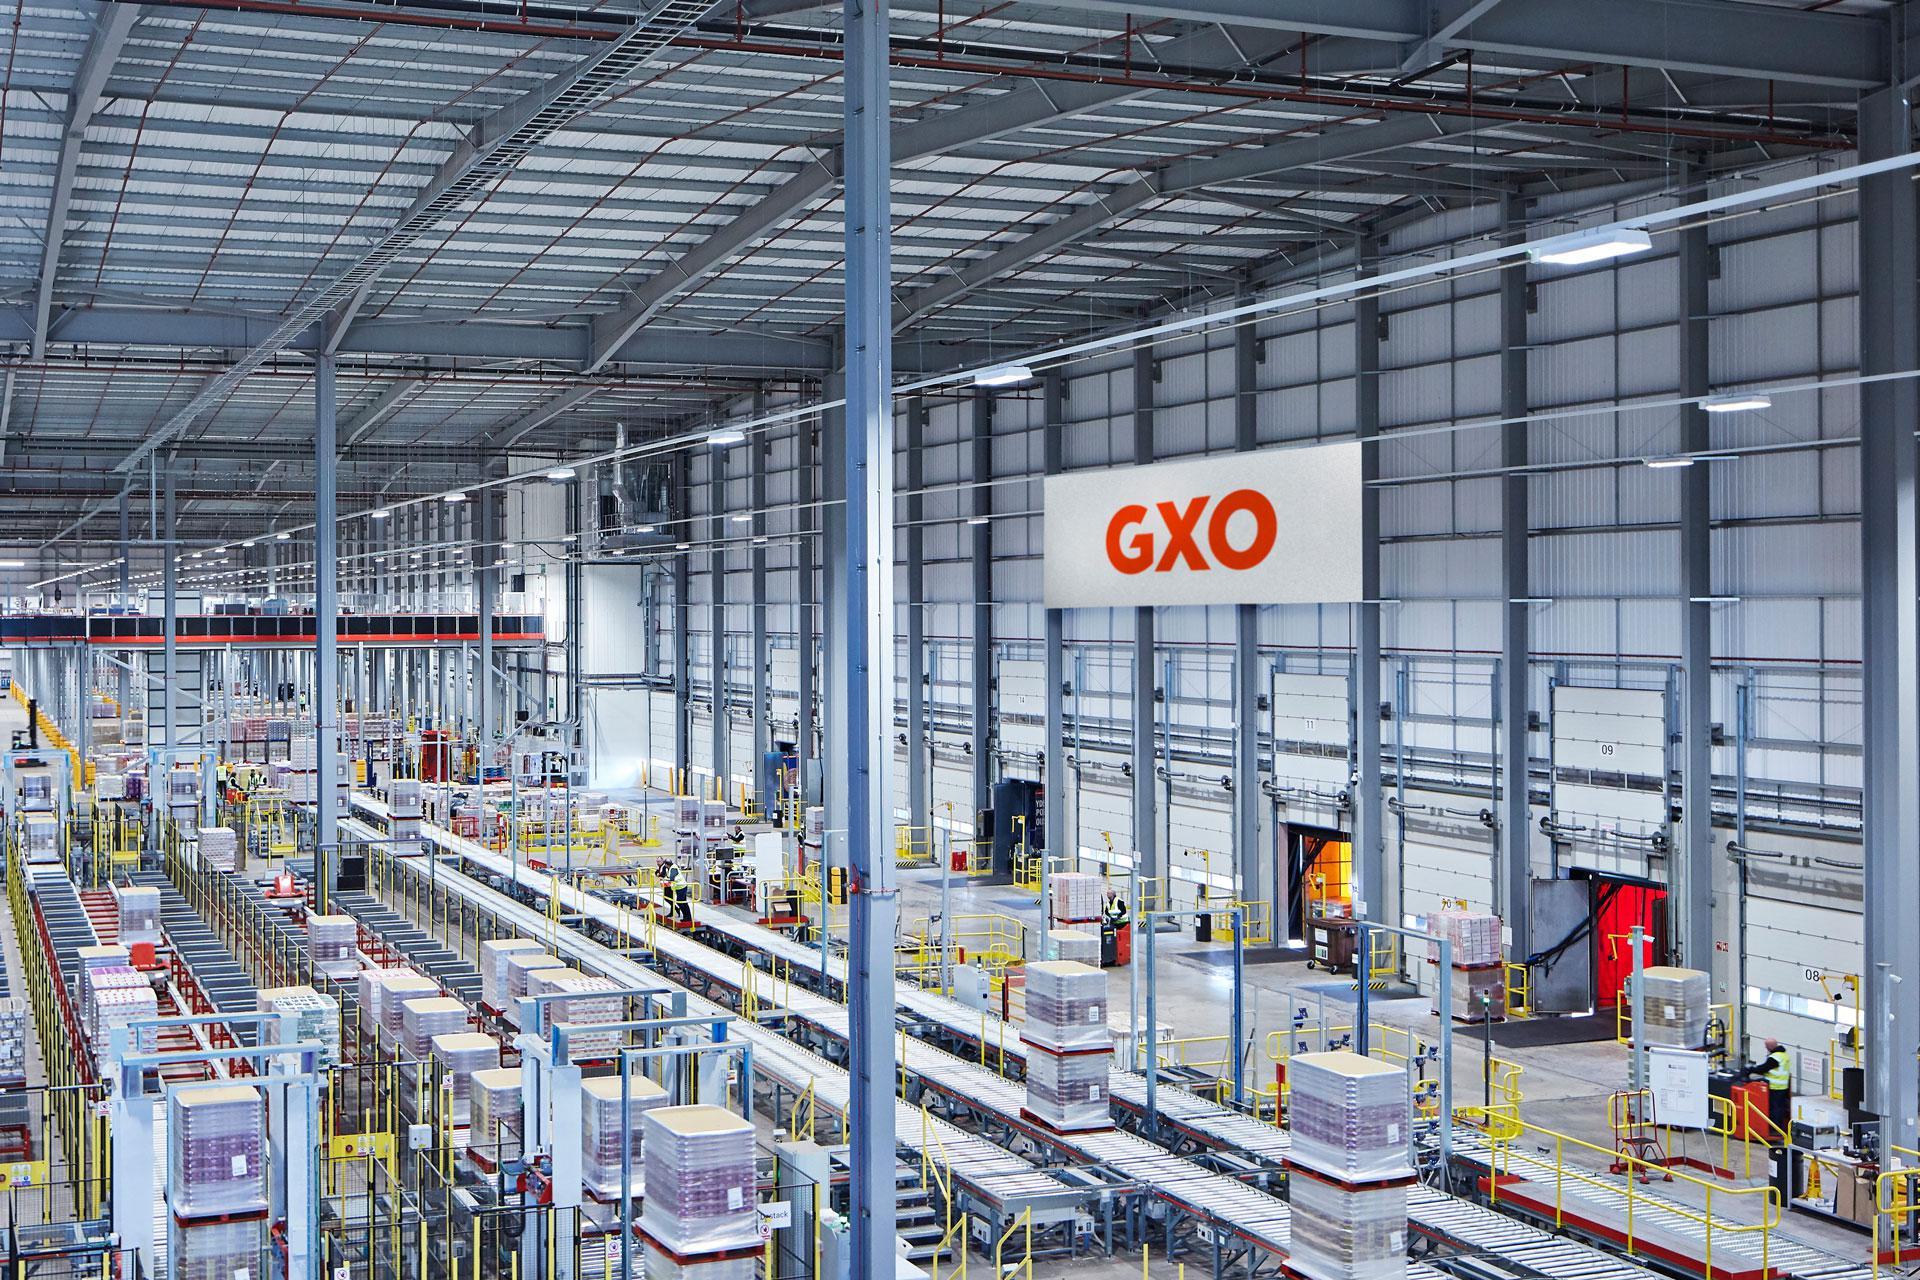 GXO, a pure-play contract logistics company